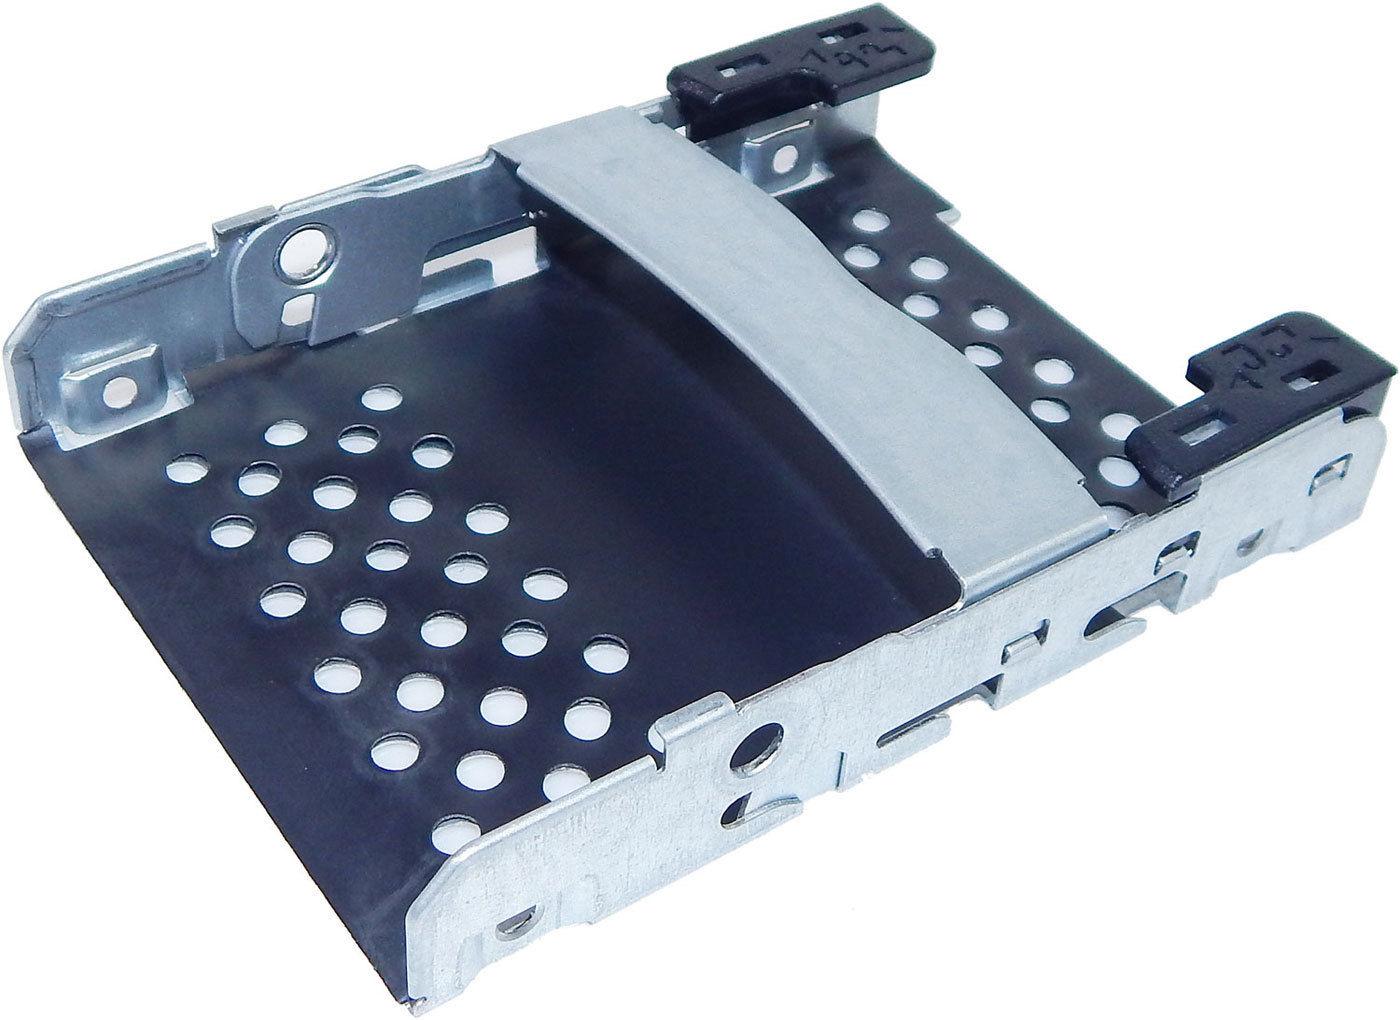 HP SL160 SL165Z SL170 G6 G7 2.5'' Quick Release Hard Drive Tray (574103-001)